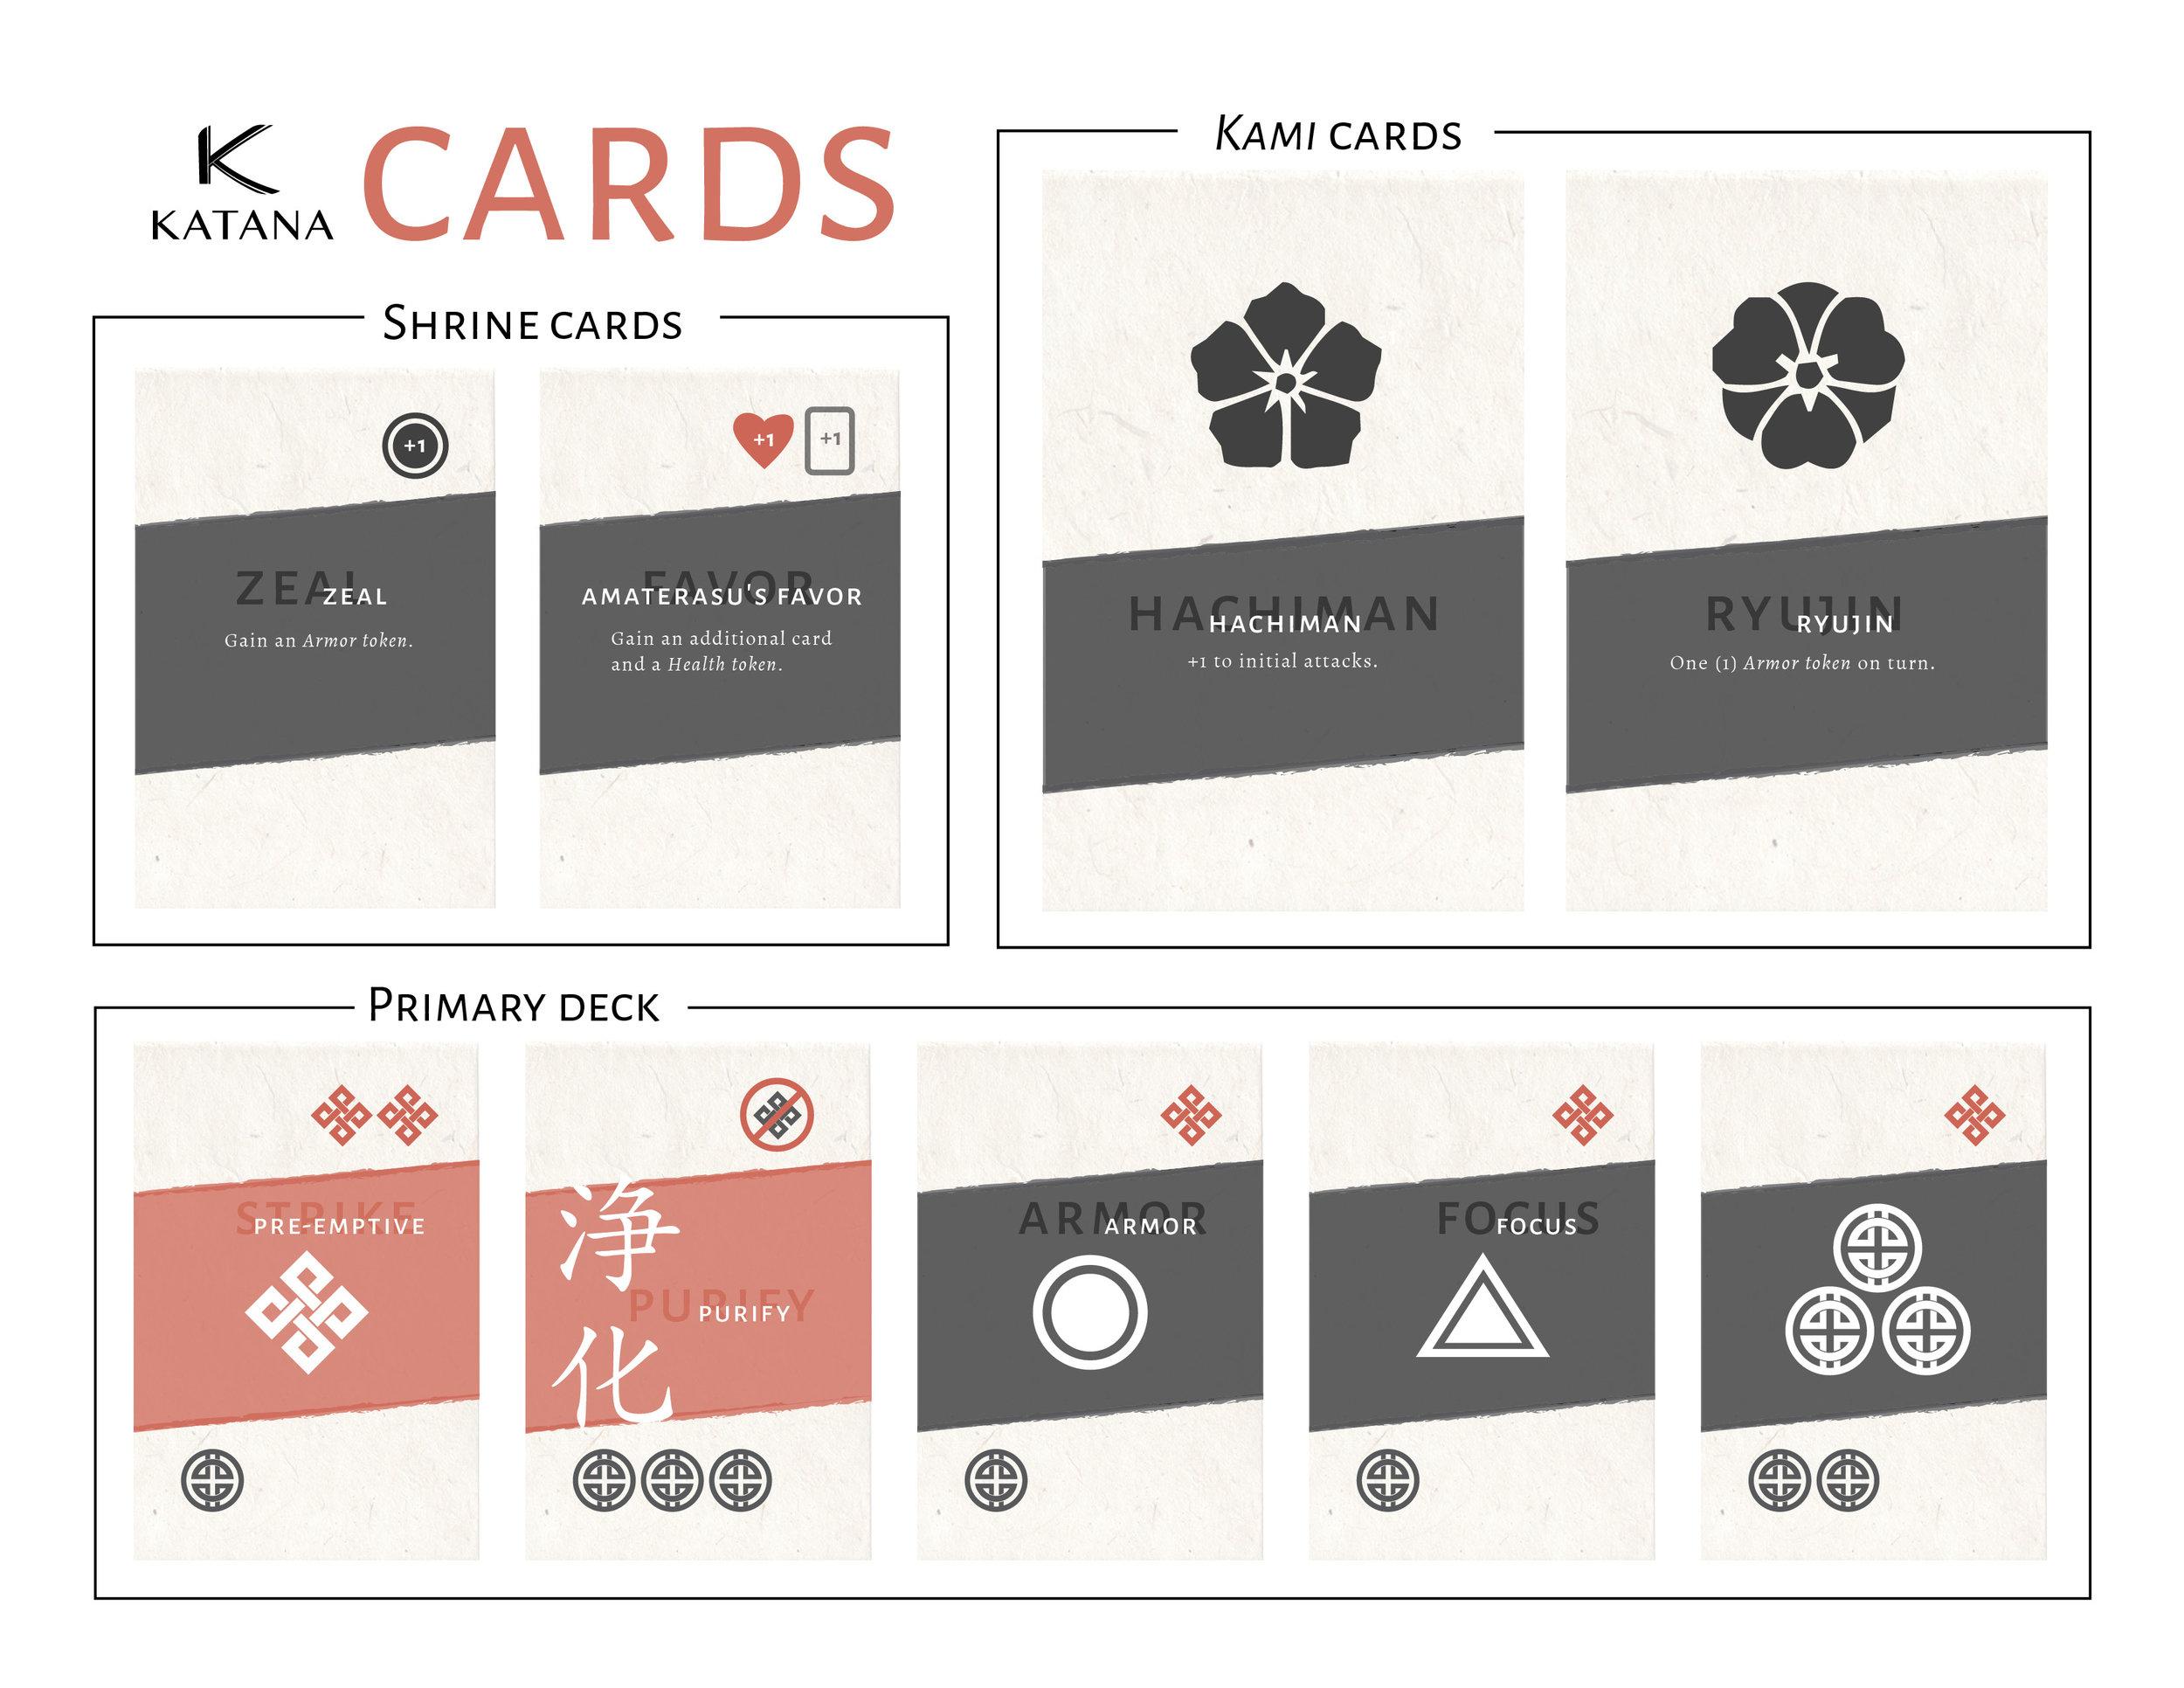 ART342P1Ccards.jpg